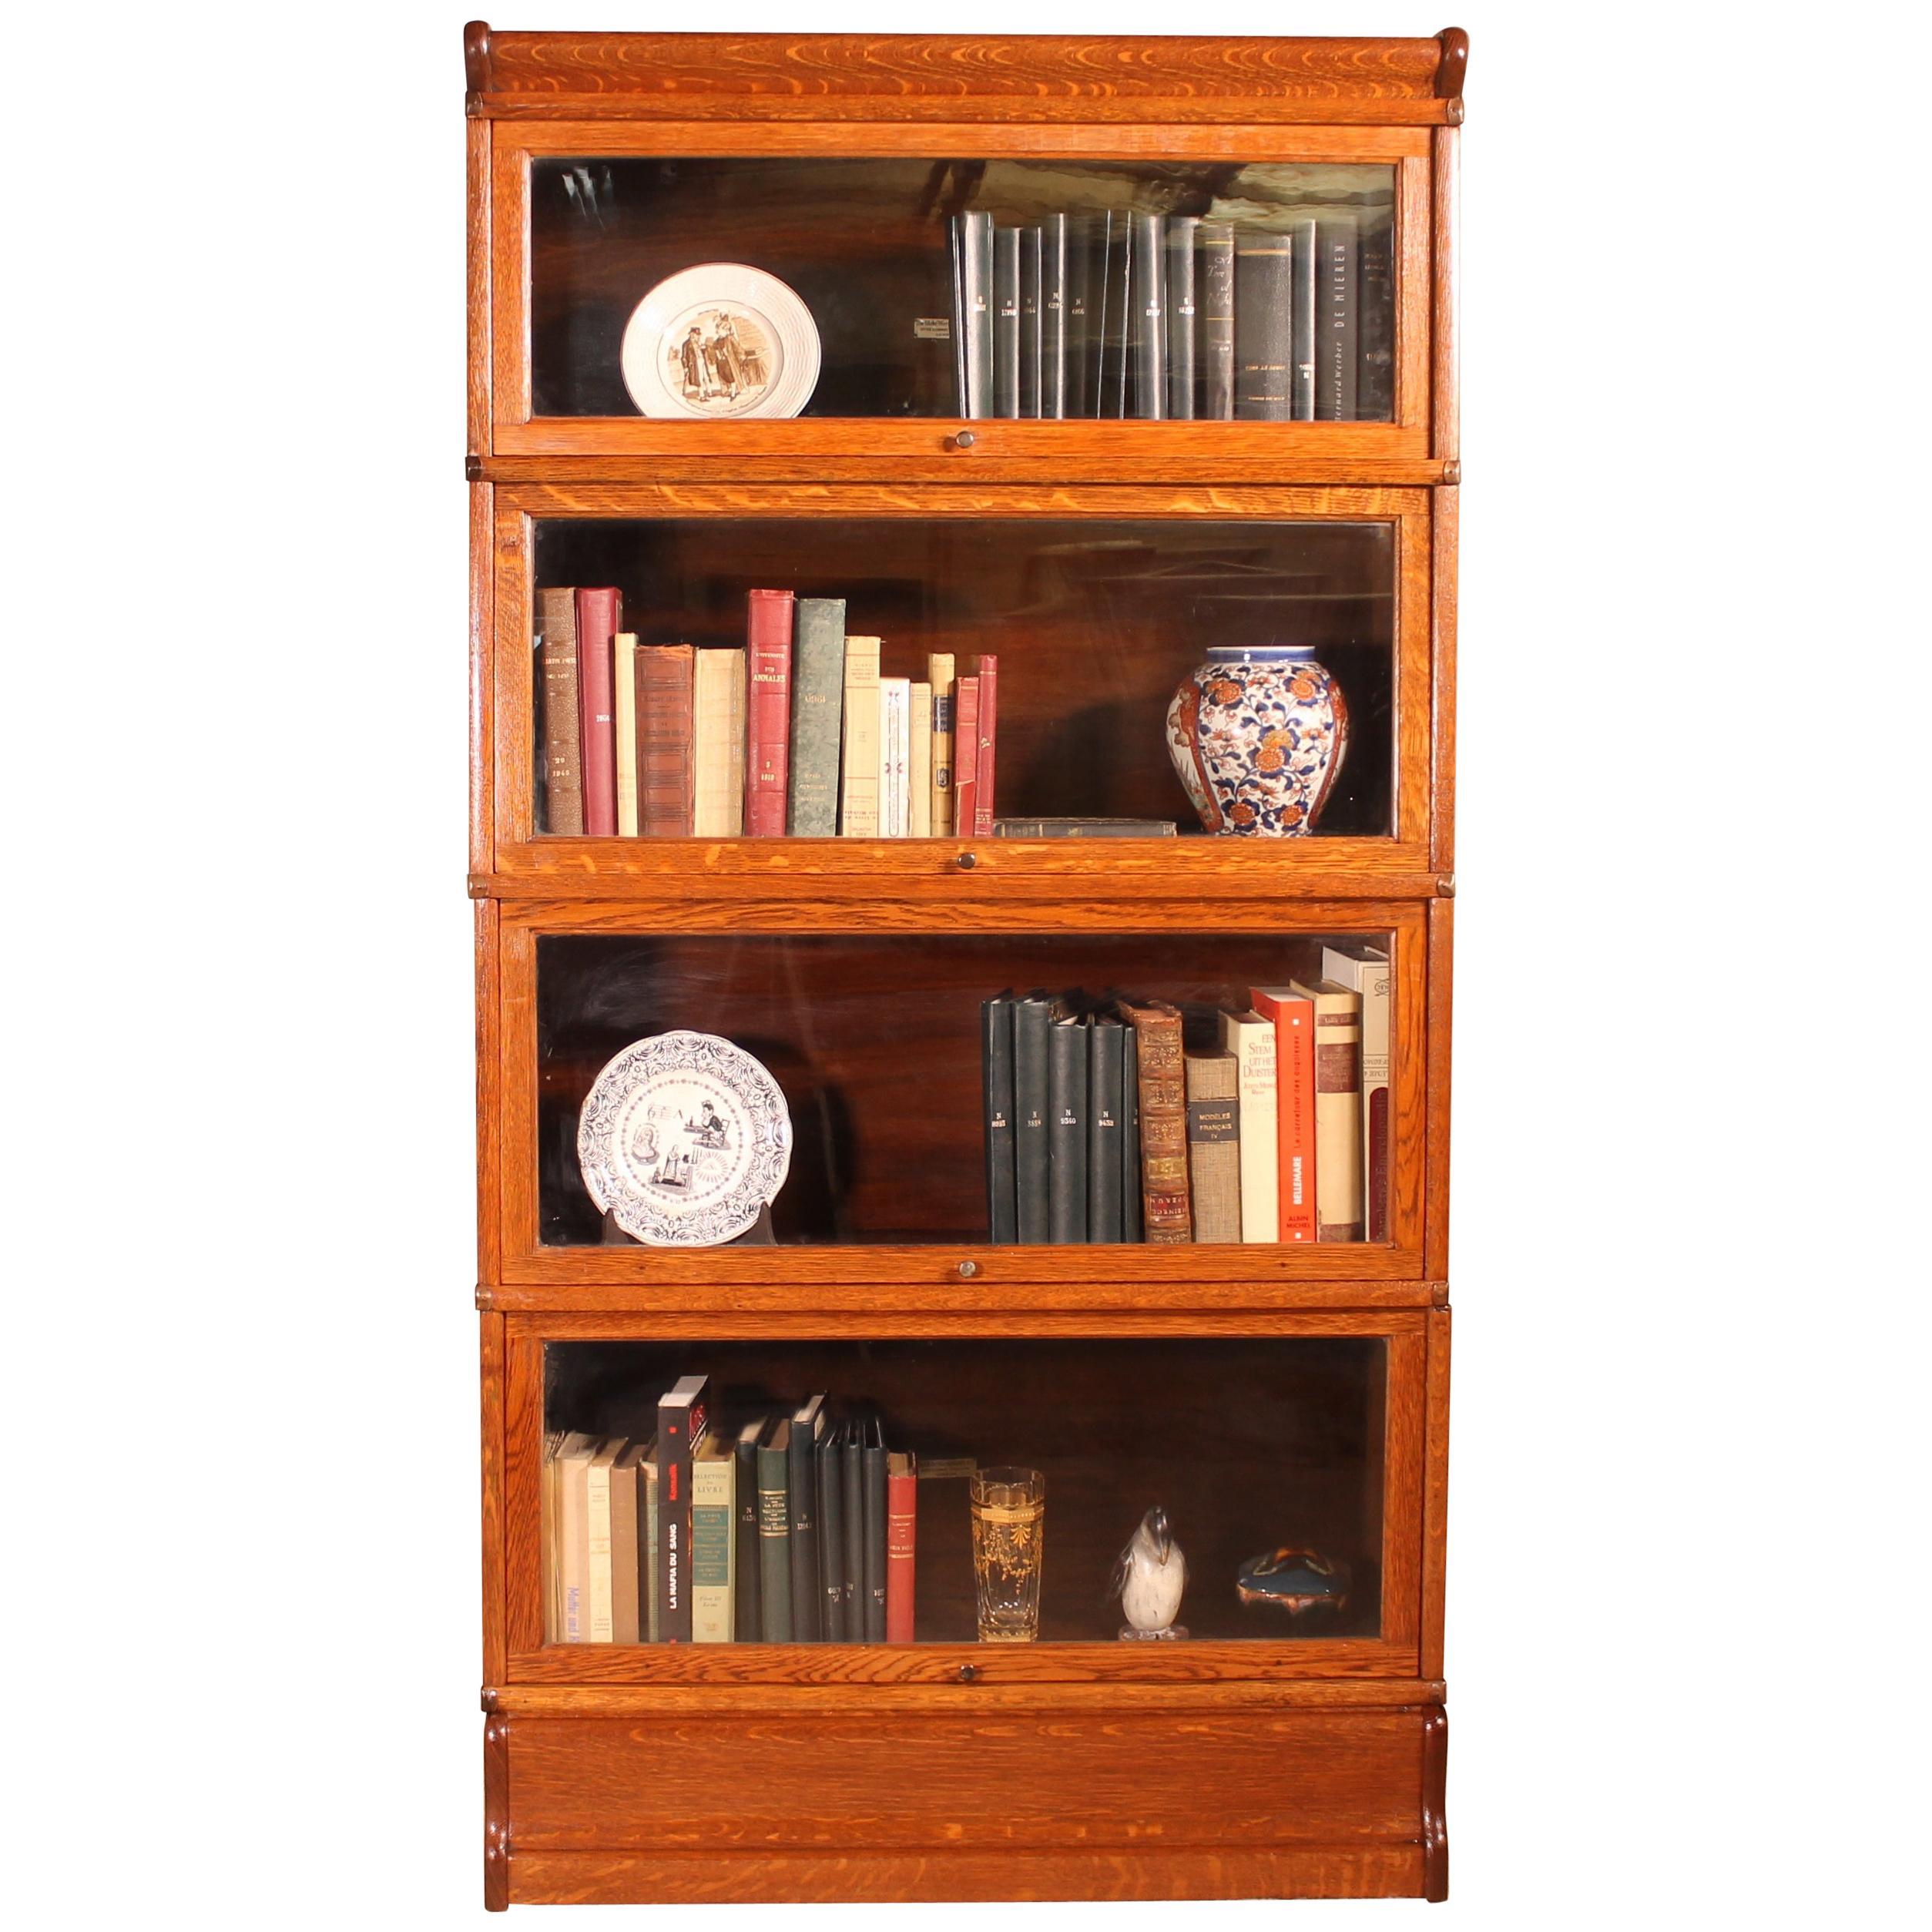 Globe Wernicke Furniture - 18 For Sale at 1stdibs